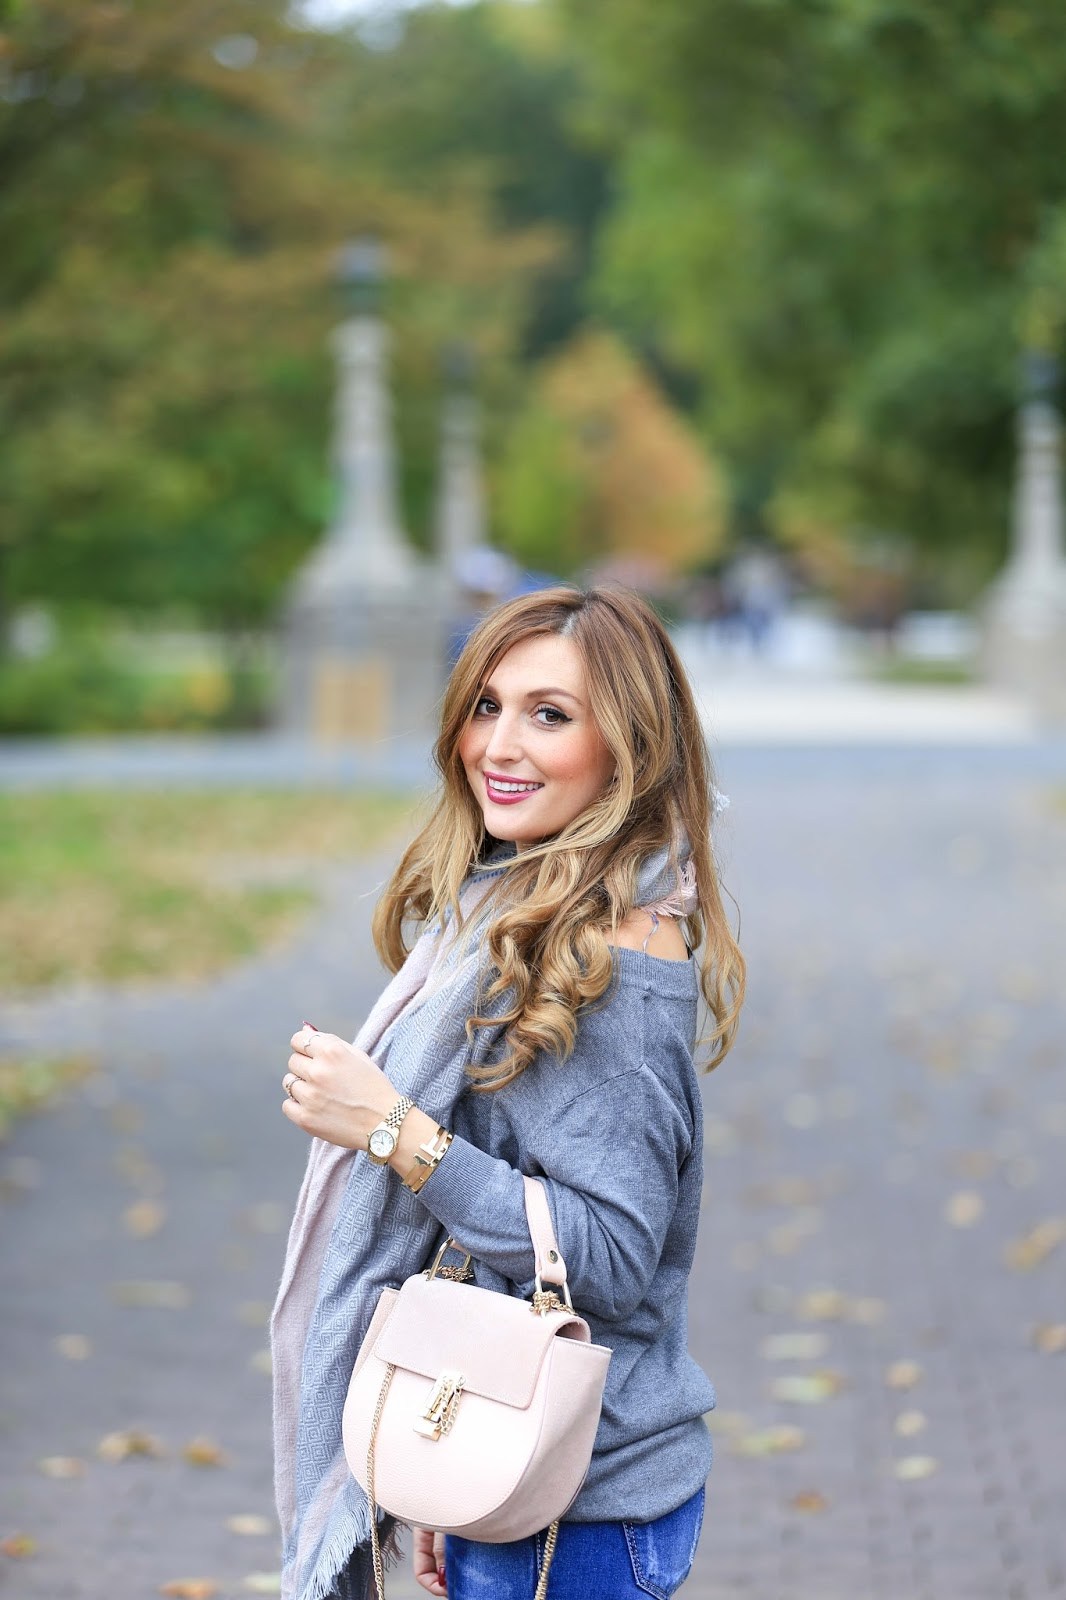 Fashionstylebyjohanna-Chloé Tasche-Lookalike Chloé.My Colloseum-Colloseum-grauer Pullover-xxl schal kombinieren-schwarze overknees-blogger aus Deutschland-deutsche Fashionblogger-aus-Frankfur